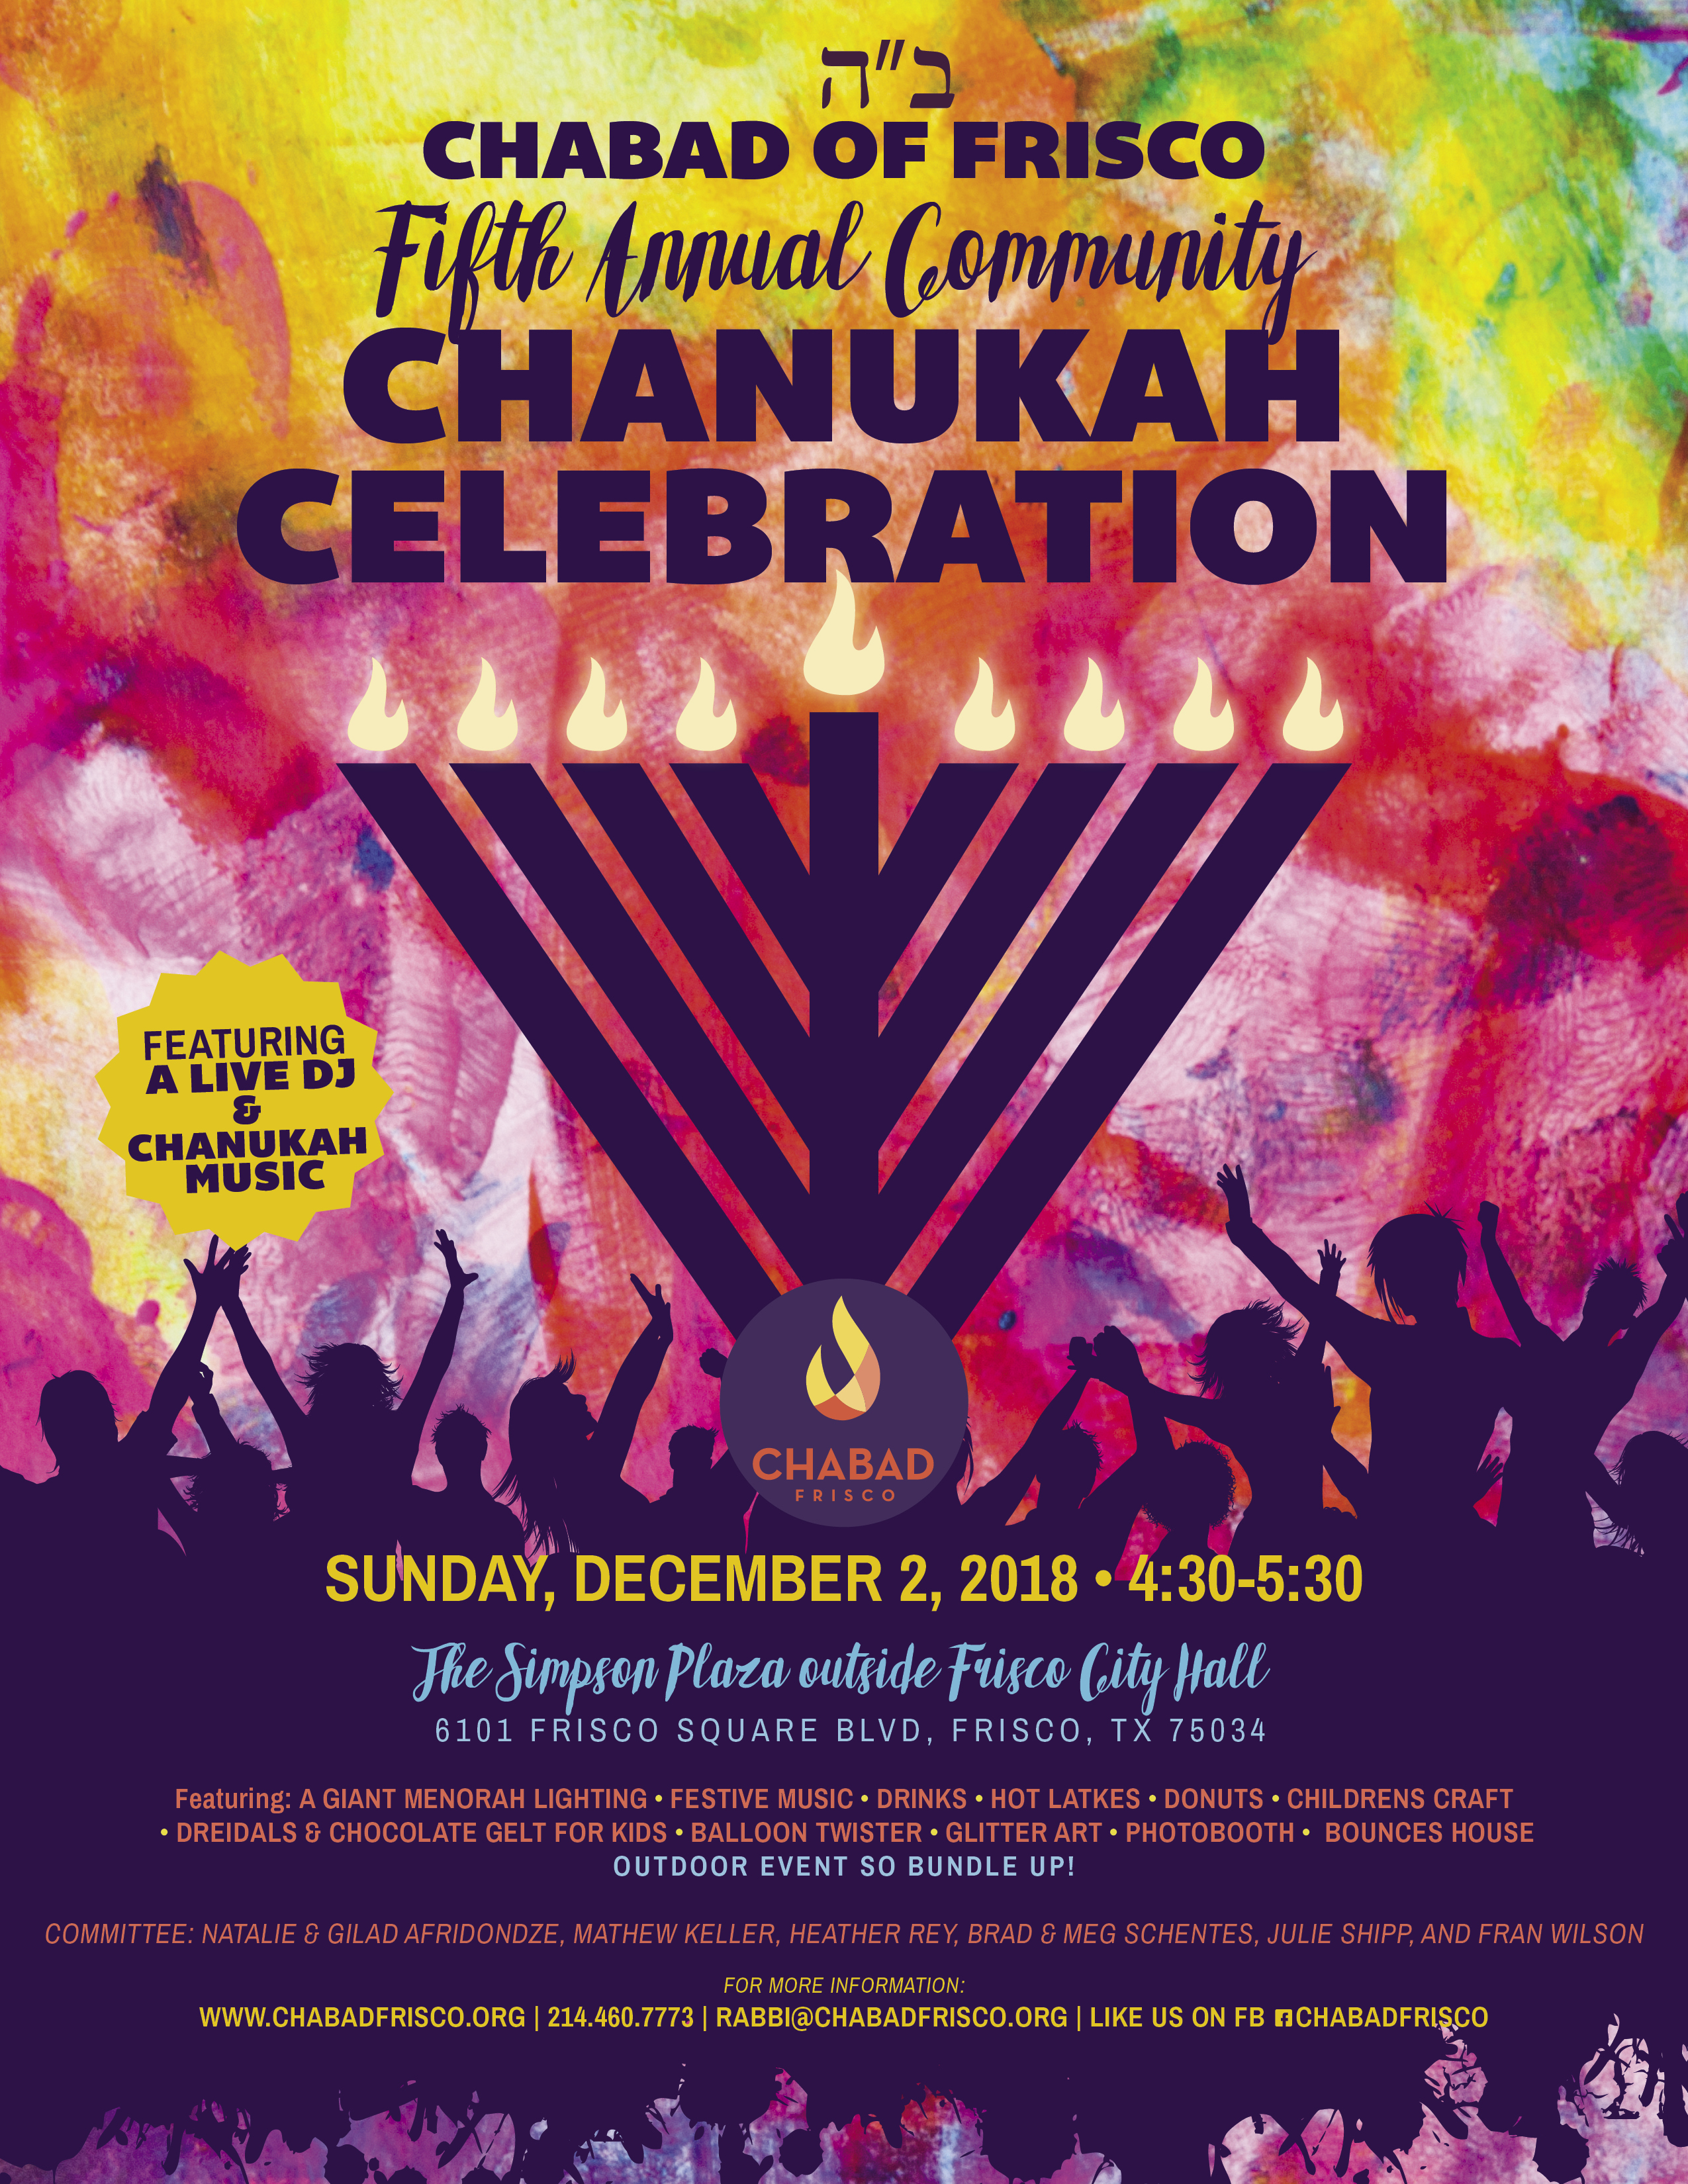 Chanukah Flyer 5778 JPeg for web.jpg